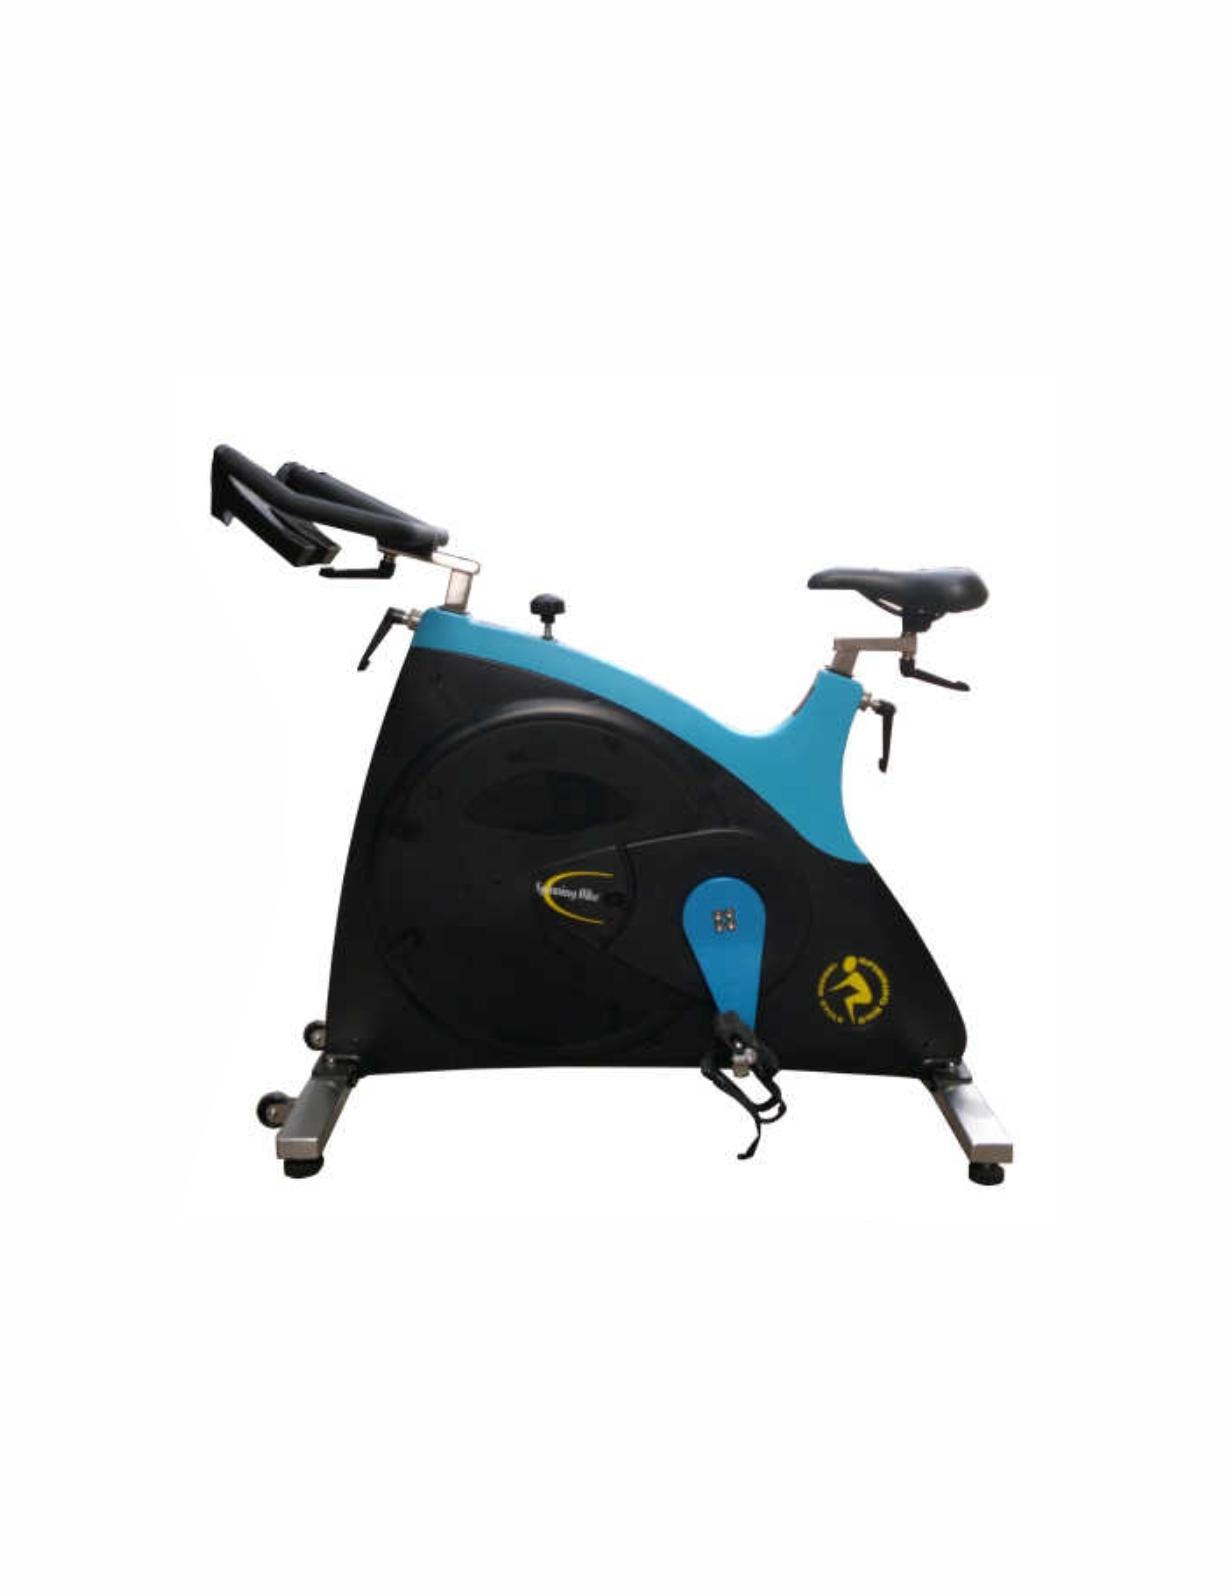 WC4301 Spin bike